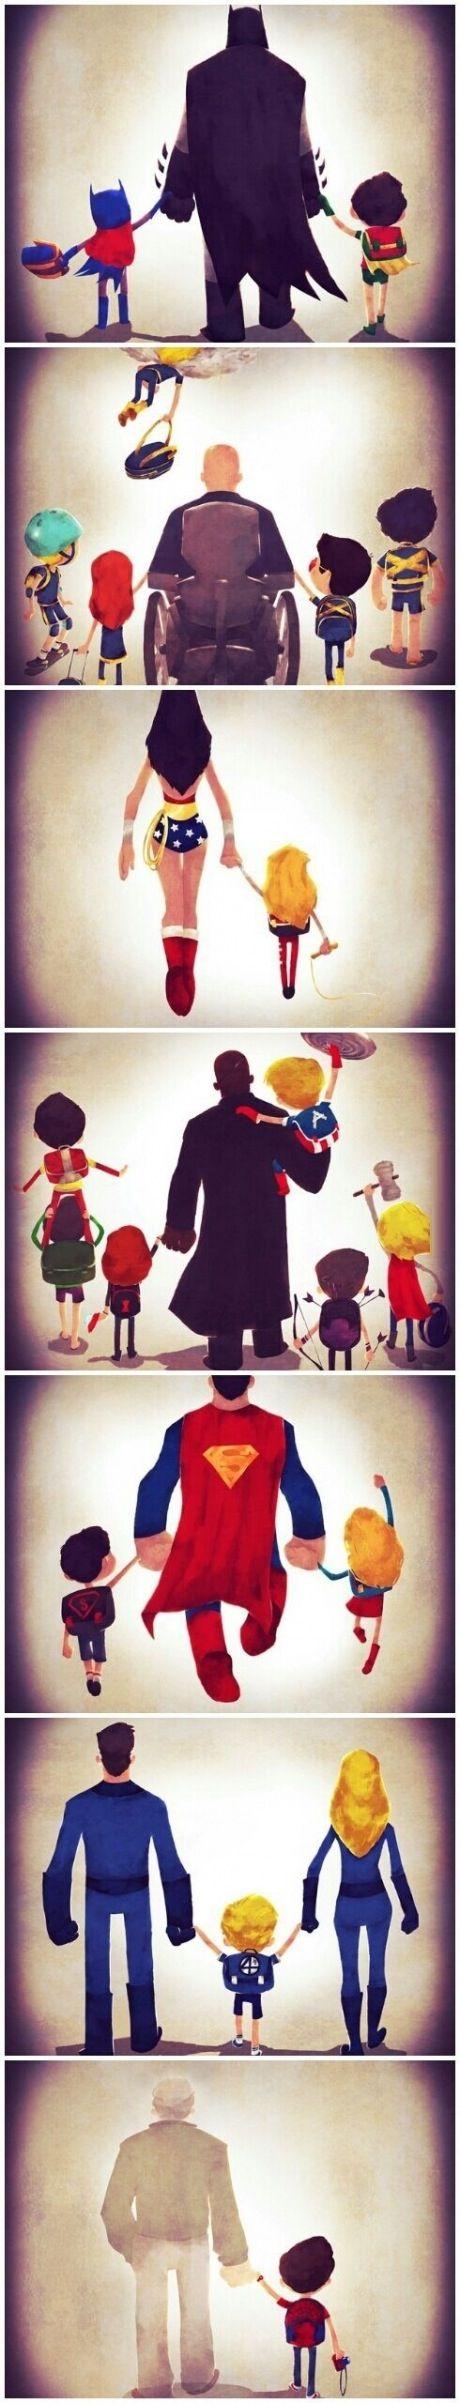 Superhero families